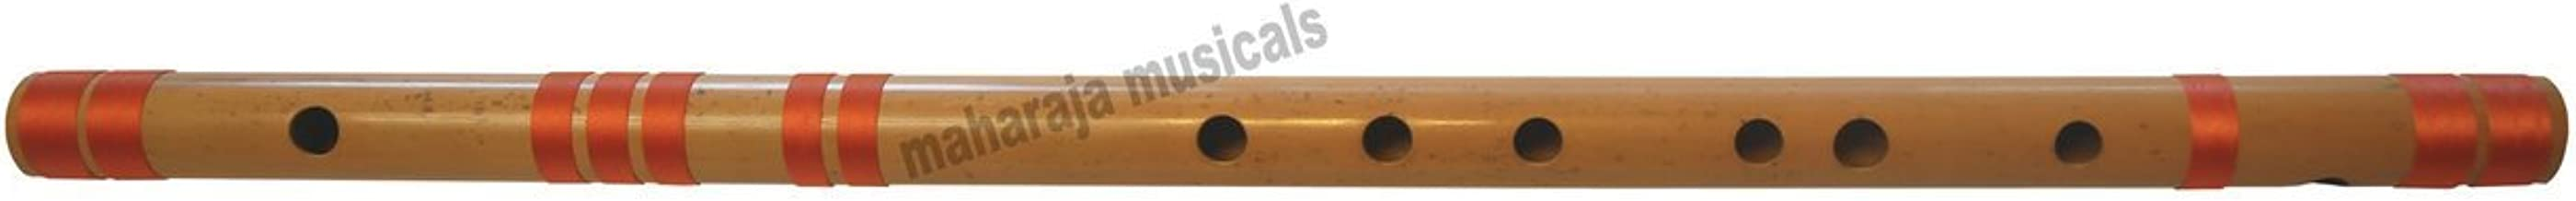 e bass bansuri flute